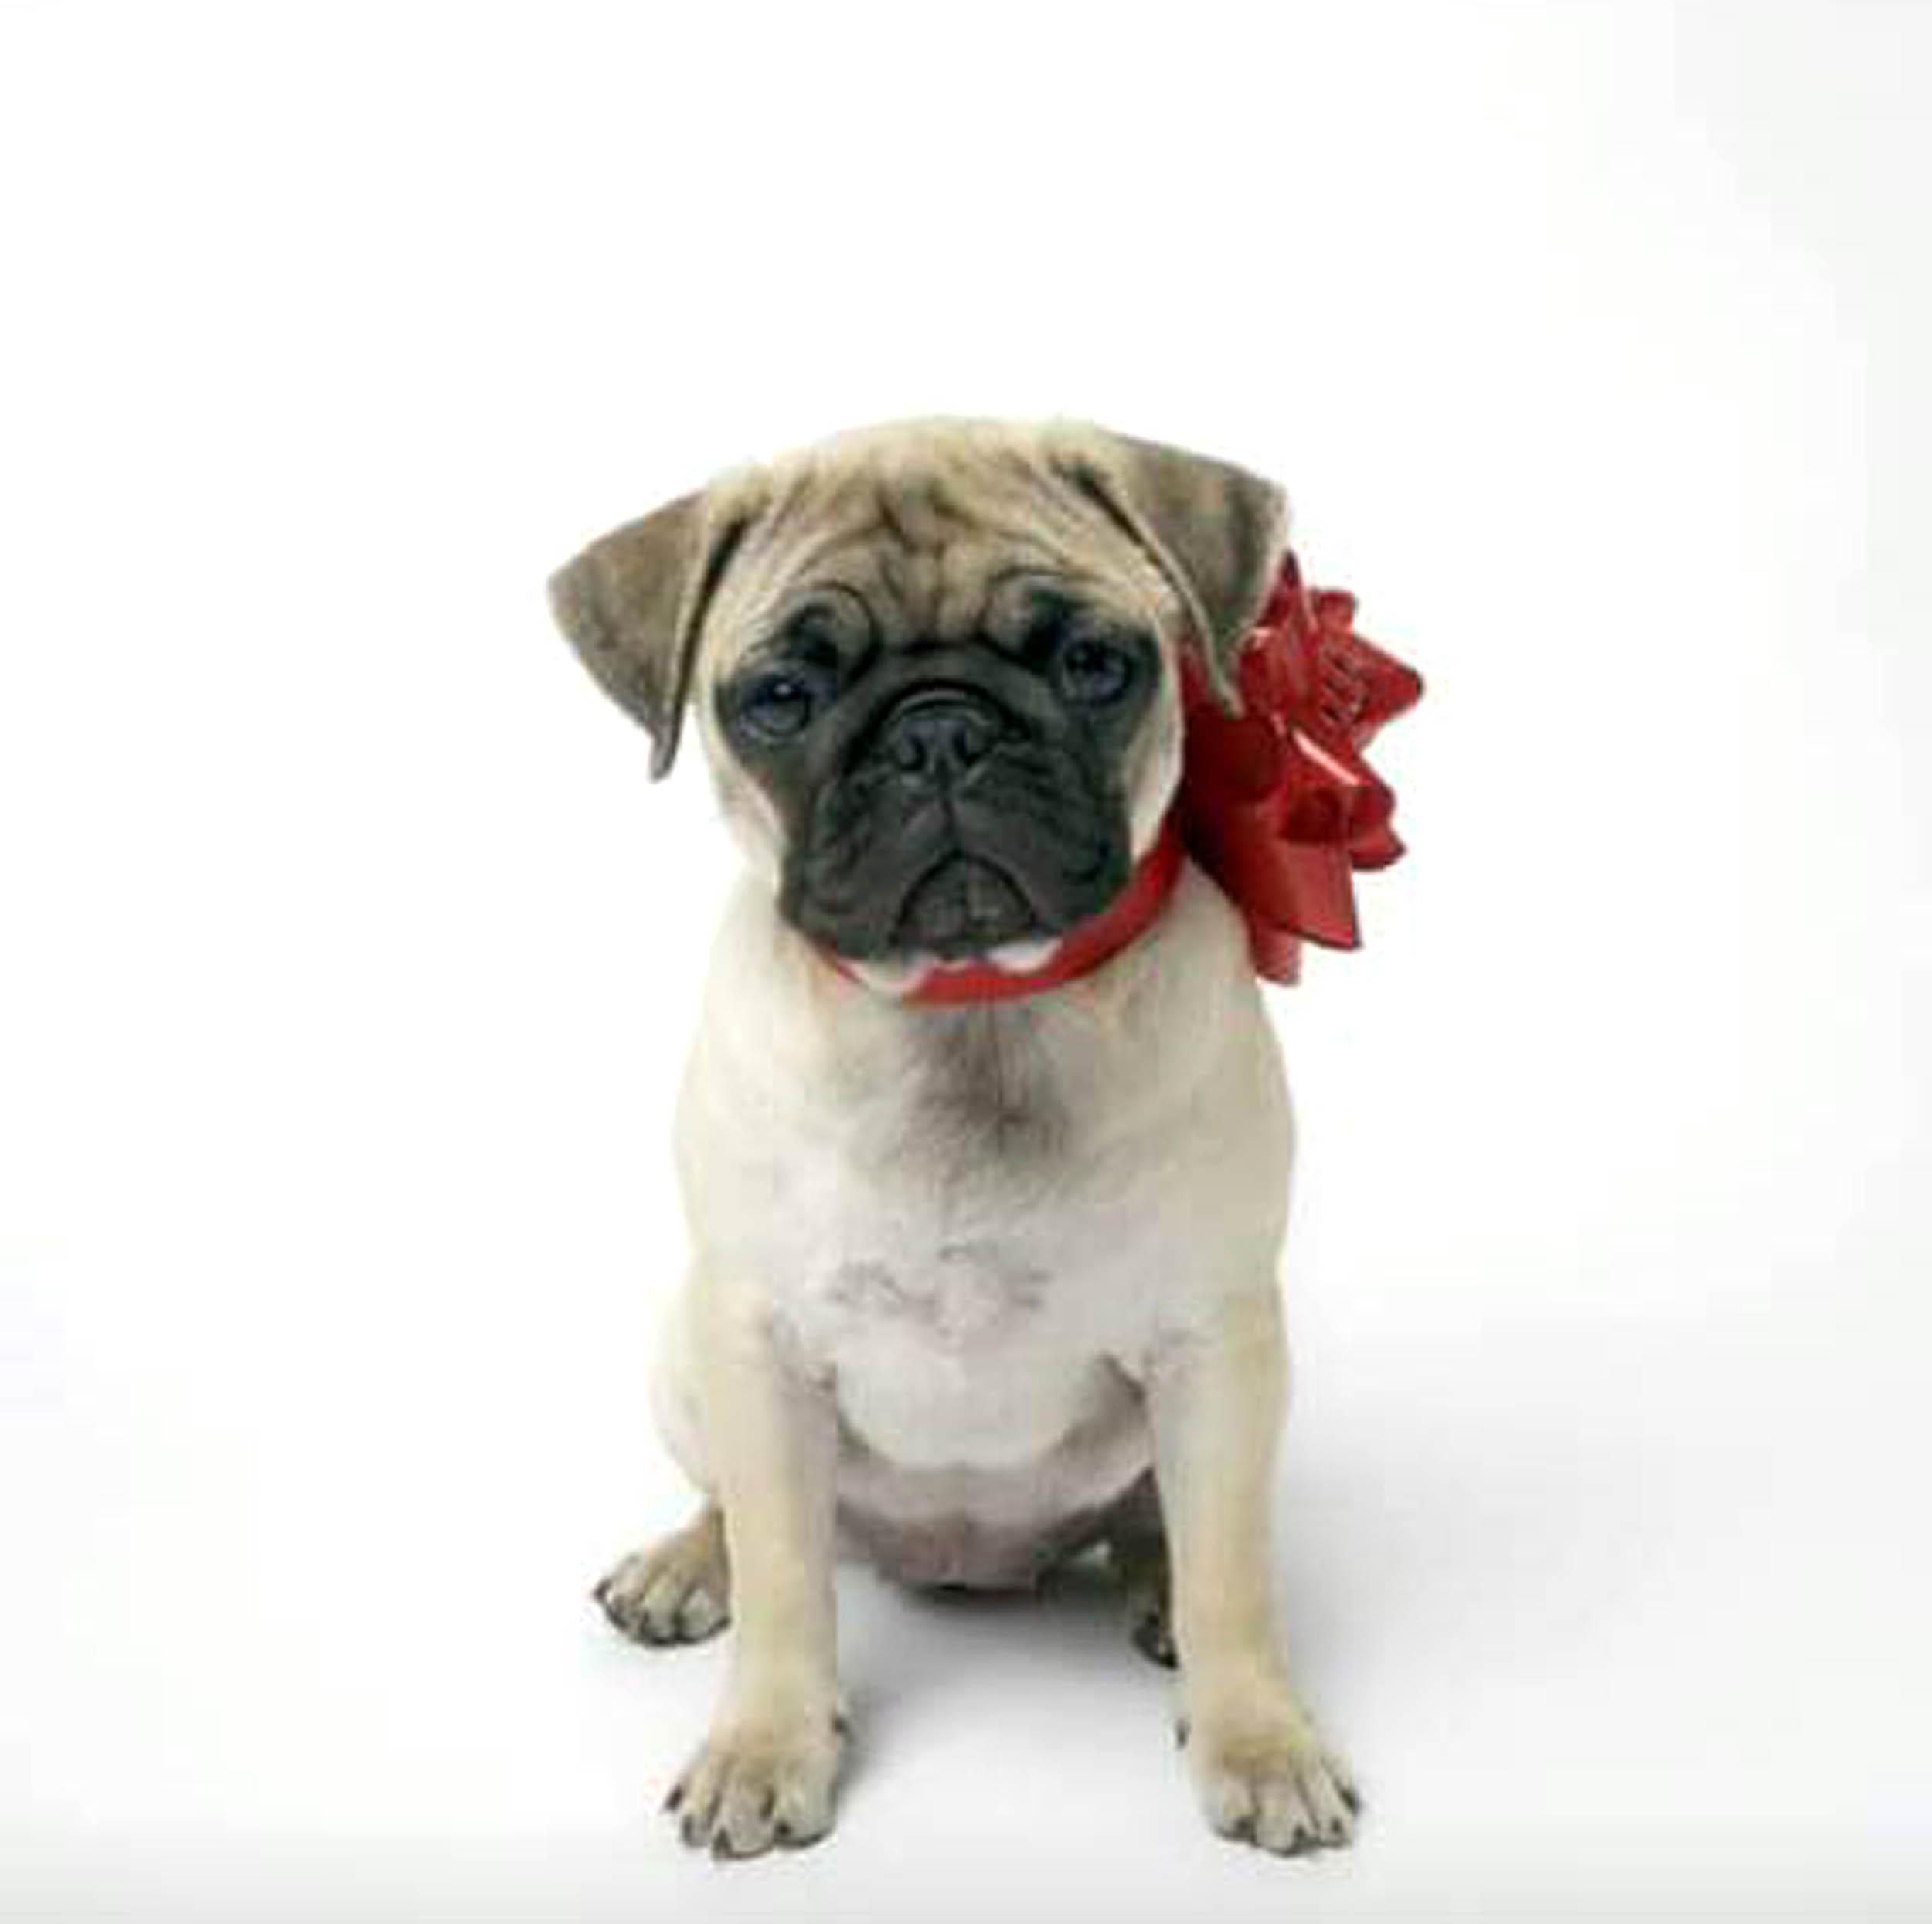 Fantastic Pug Bow Adorable Dog - HOUSE_OF_FRASER_DN02  Pic_422924  .jpg